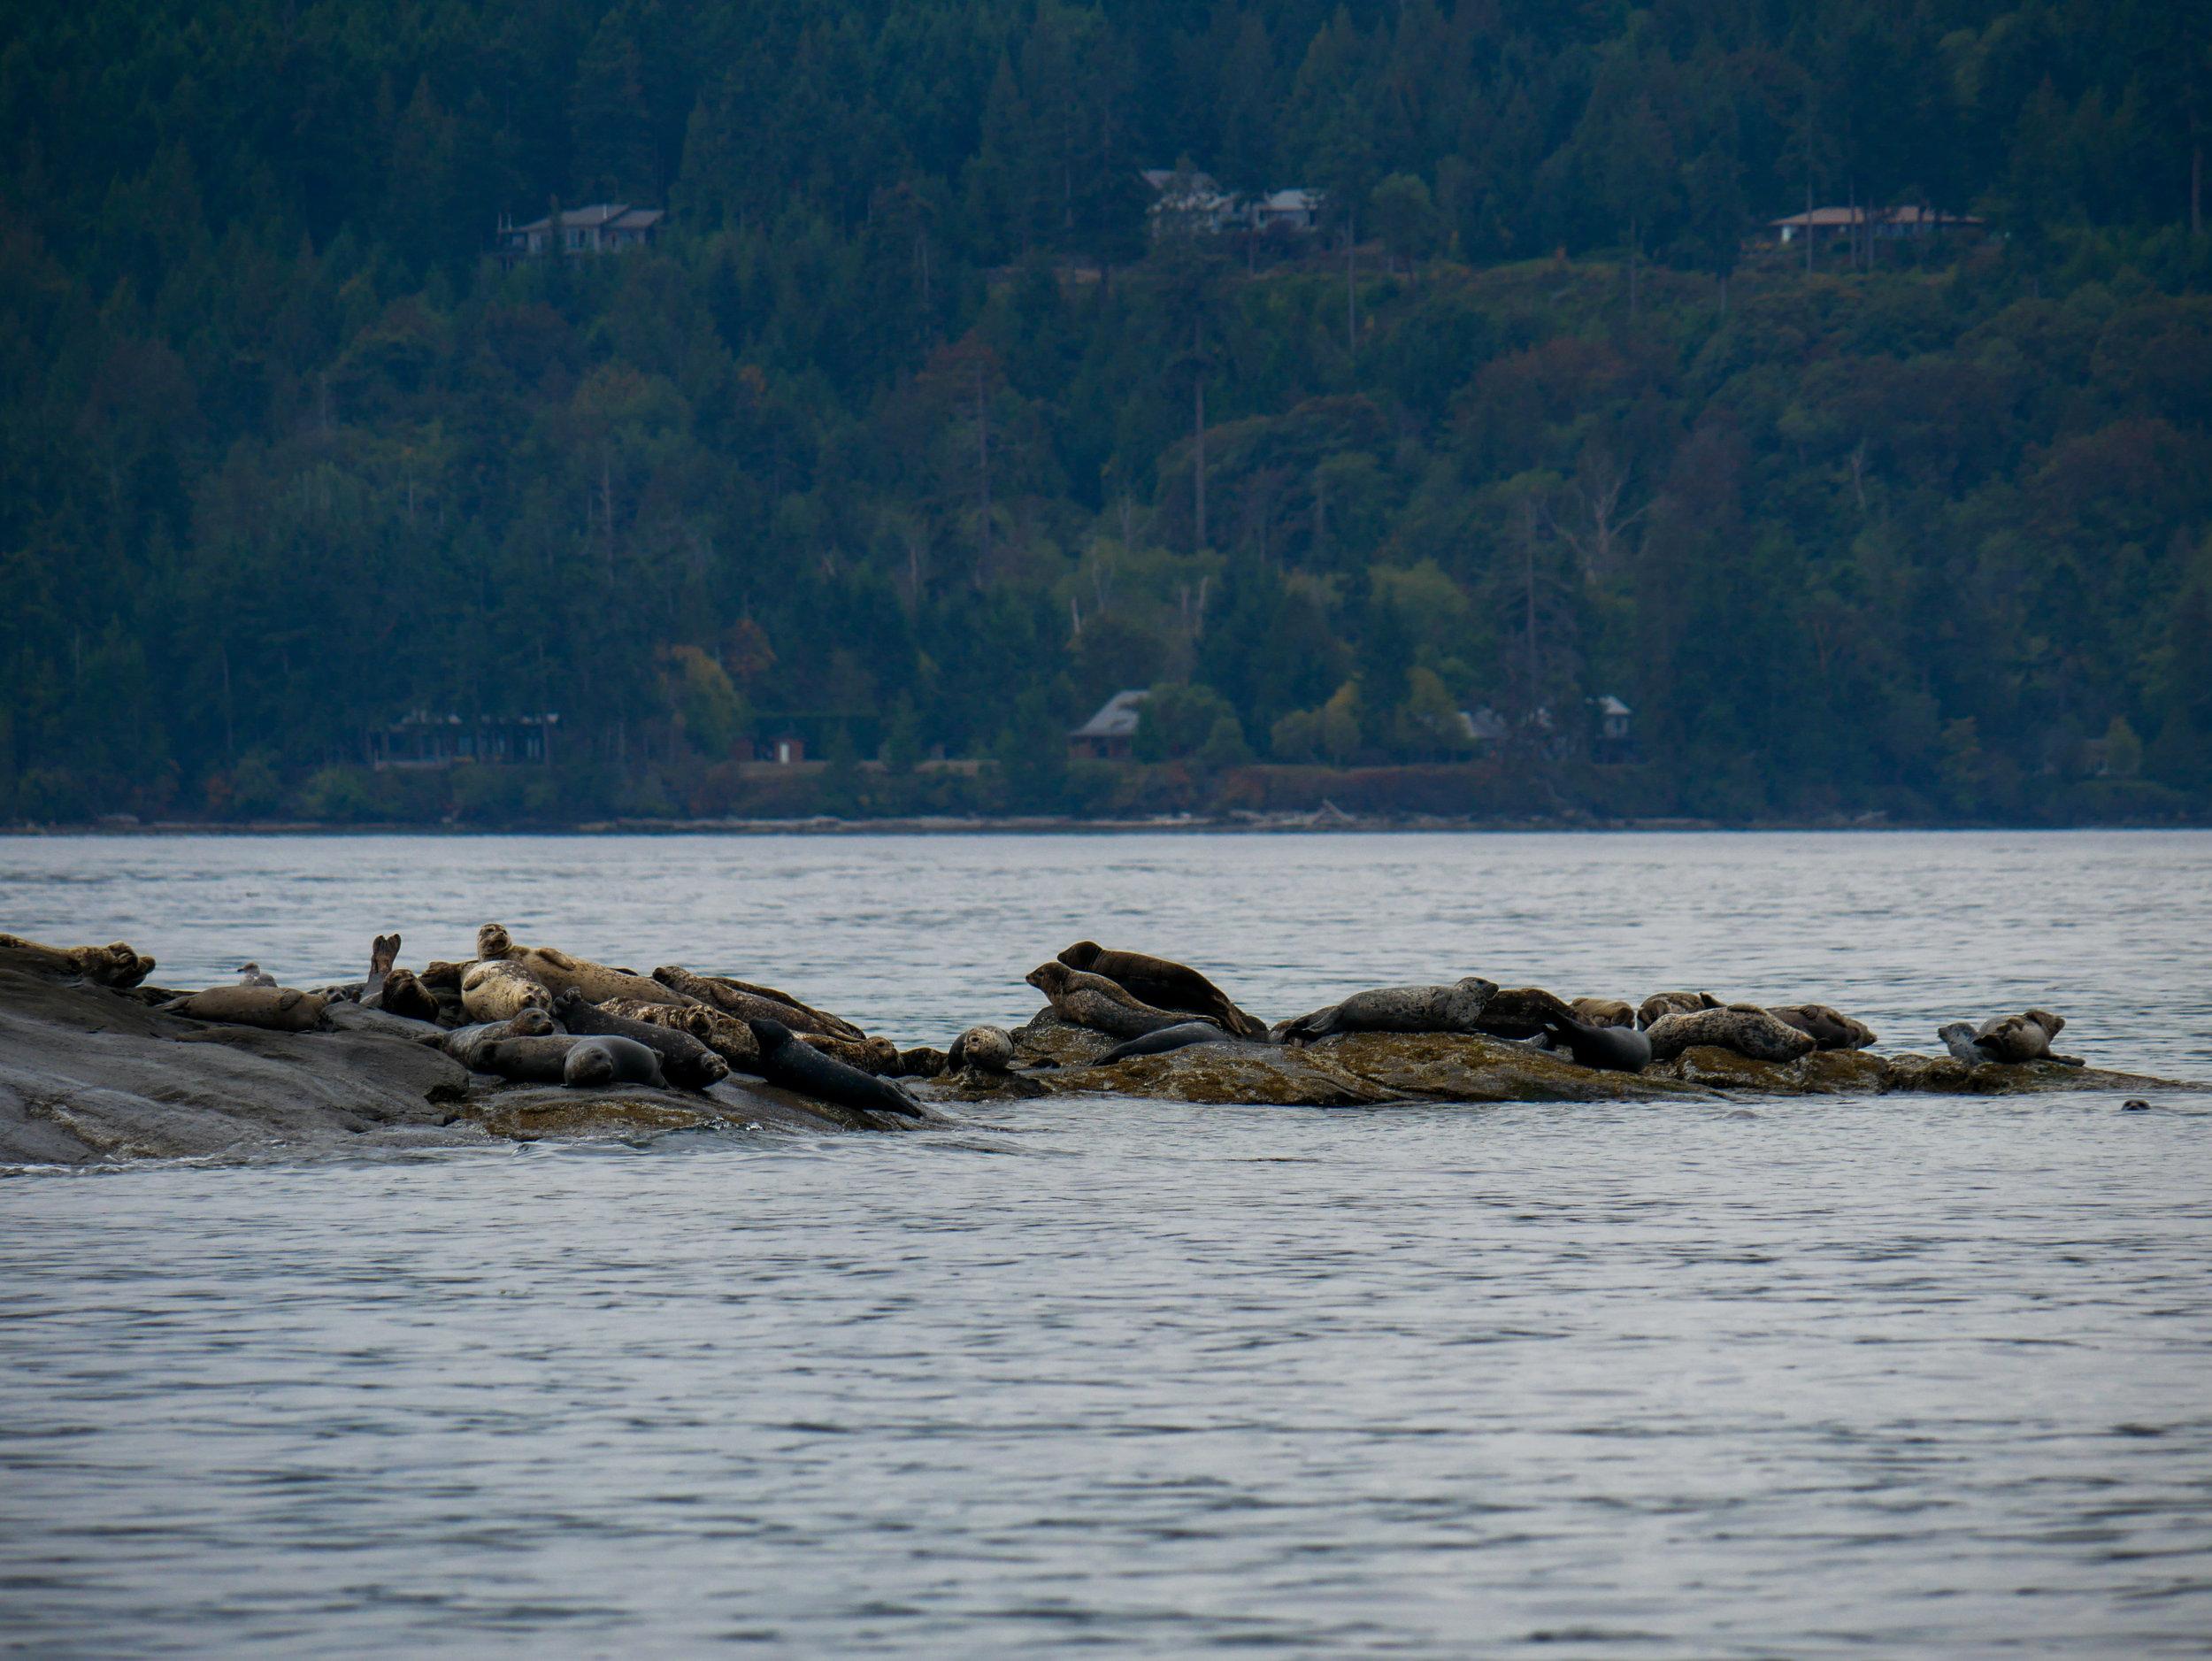 Harbour seal haul out on Entrance Island. Photo by Alanna Vivani - 10:30 tour.